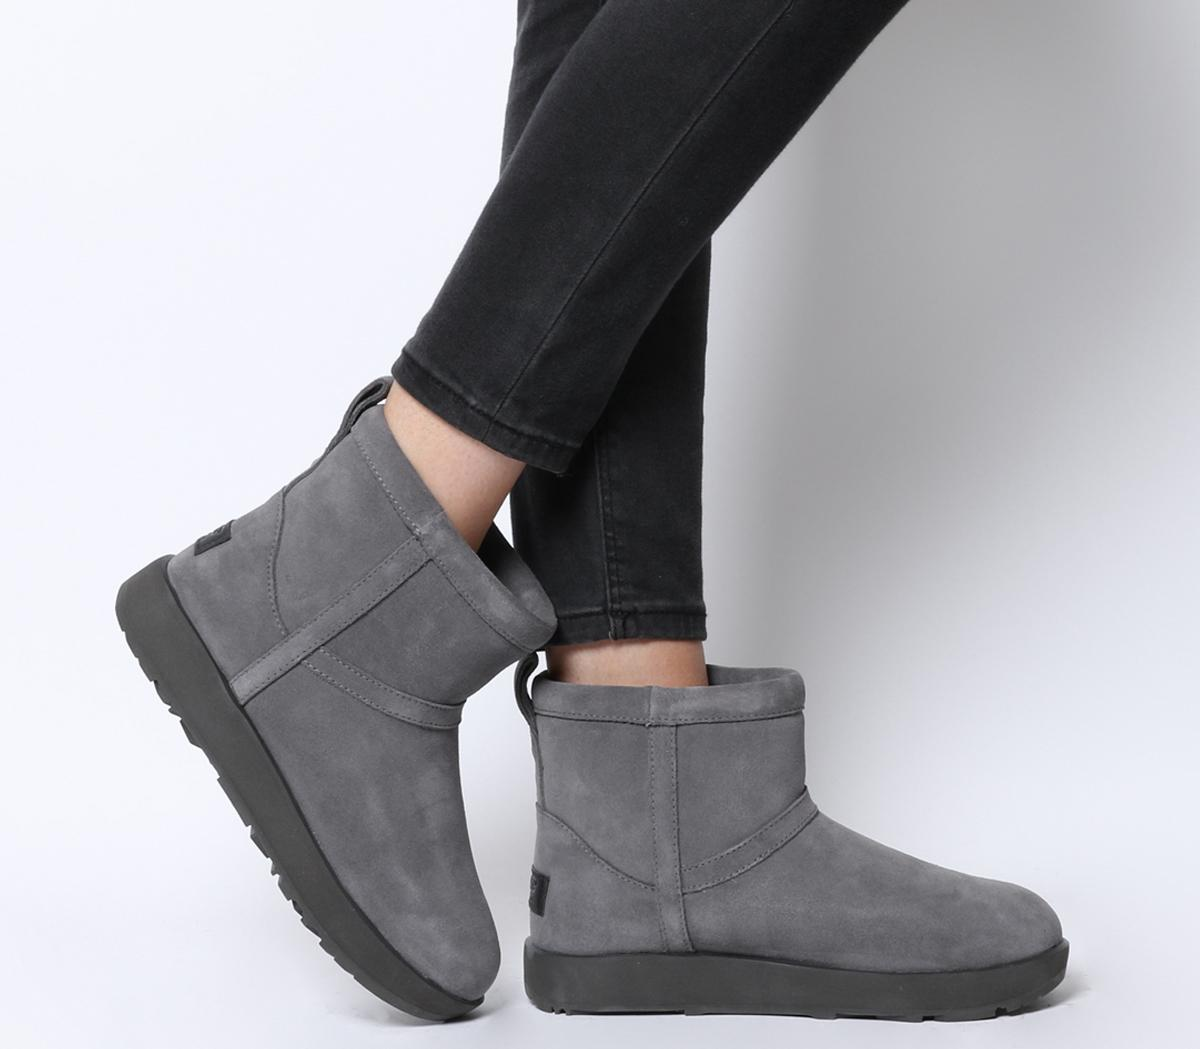 UGG Classic Mini Waterproof Boots Metal